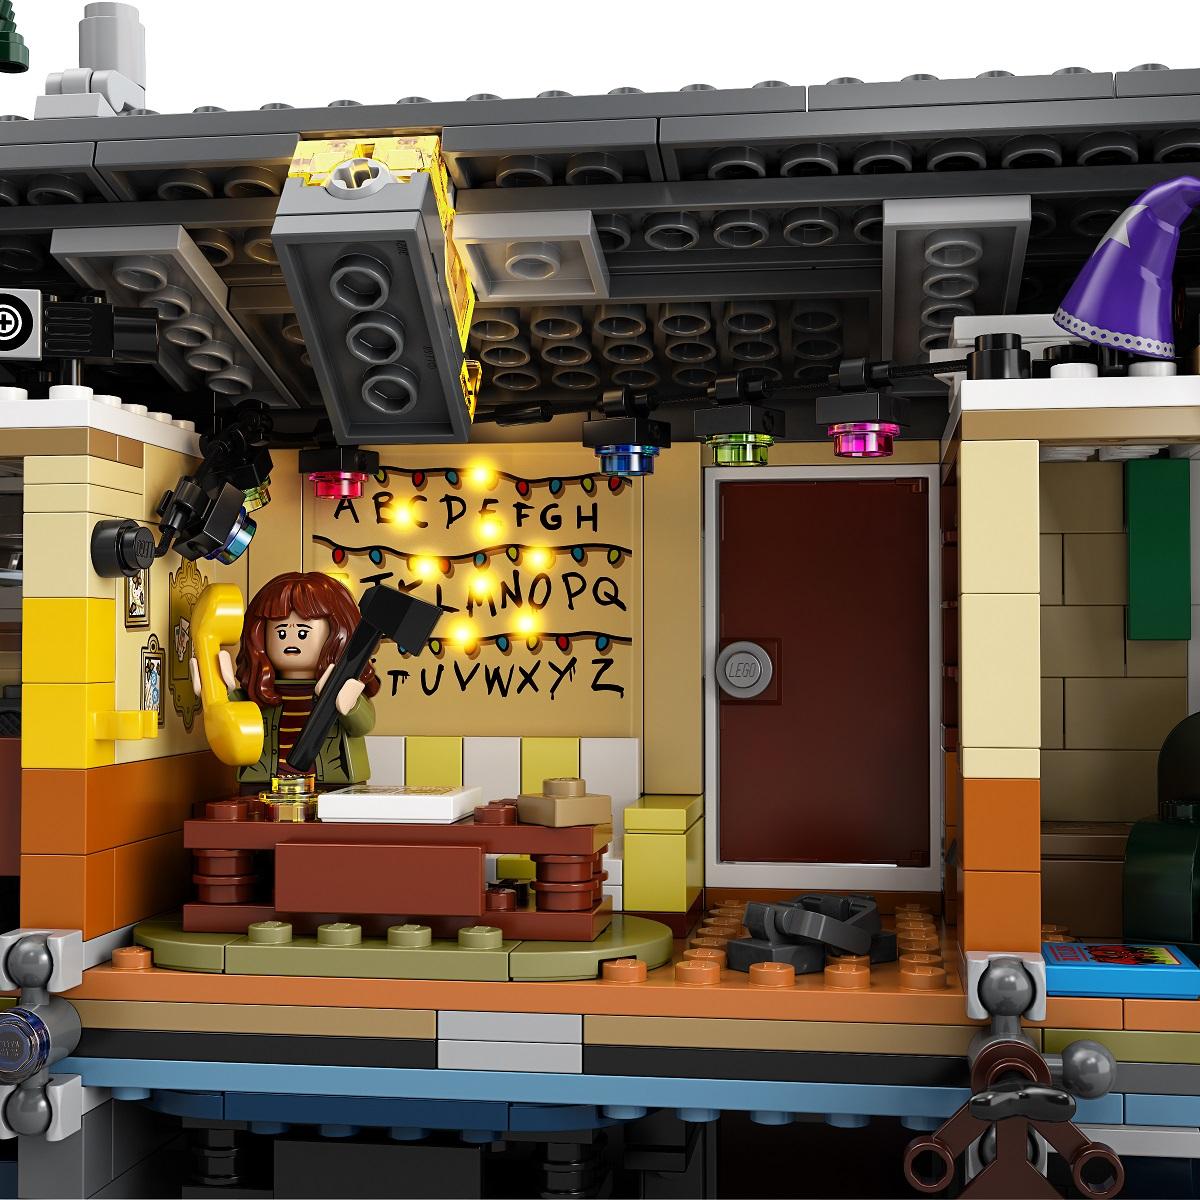 szmk_netflix_stranger_things_lego_upside_down_tothagas_3.jpg